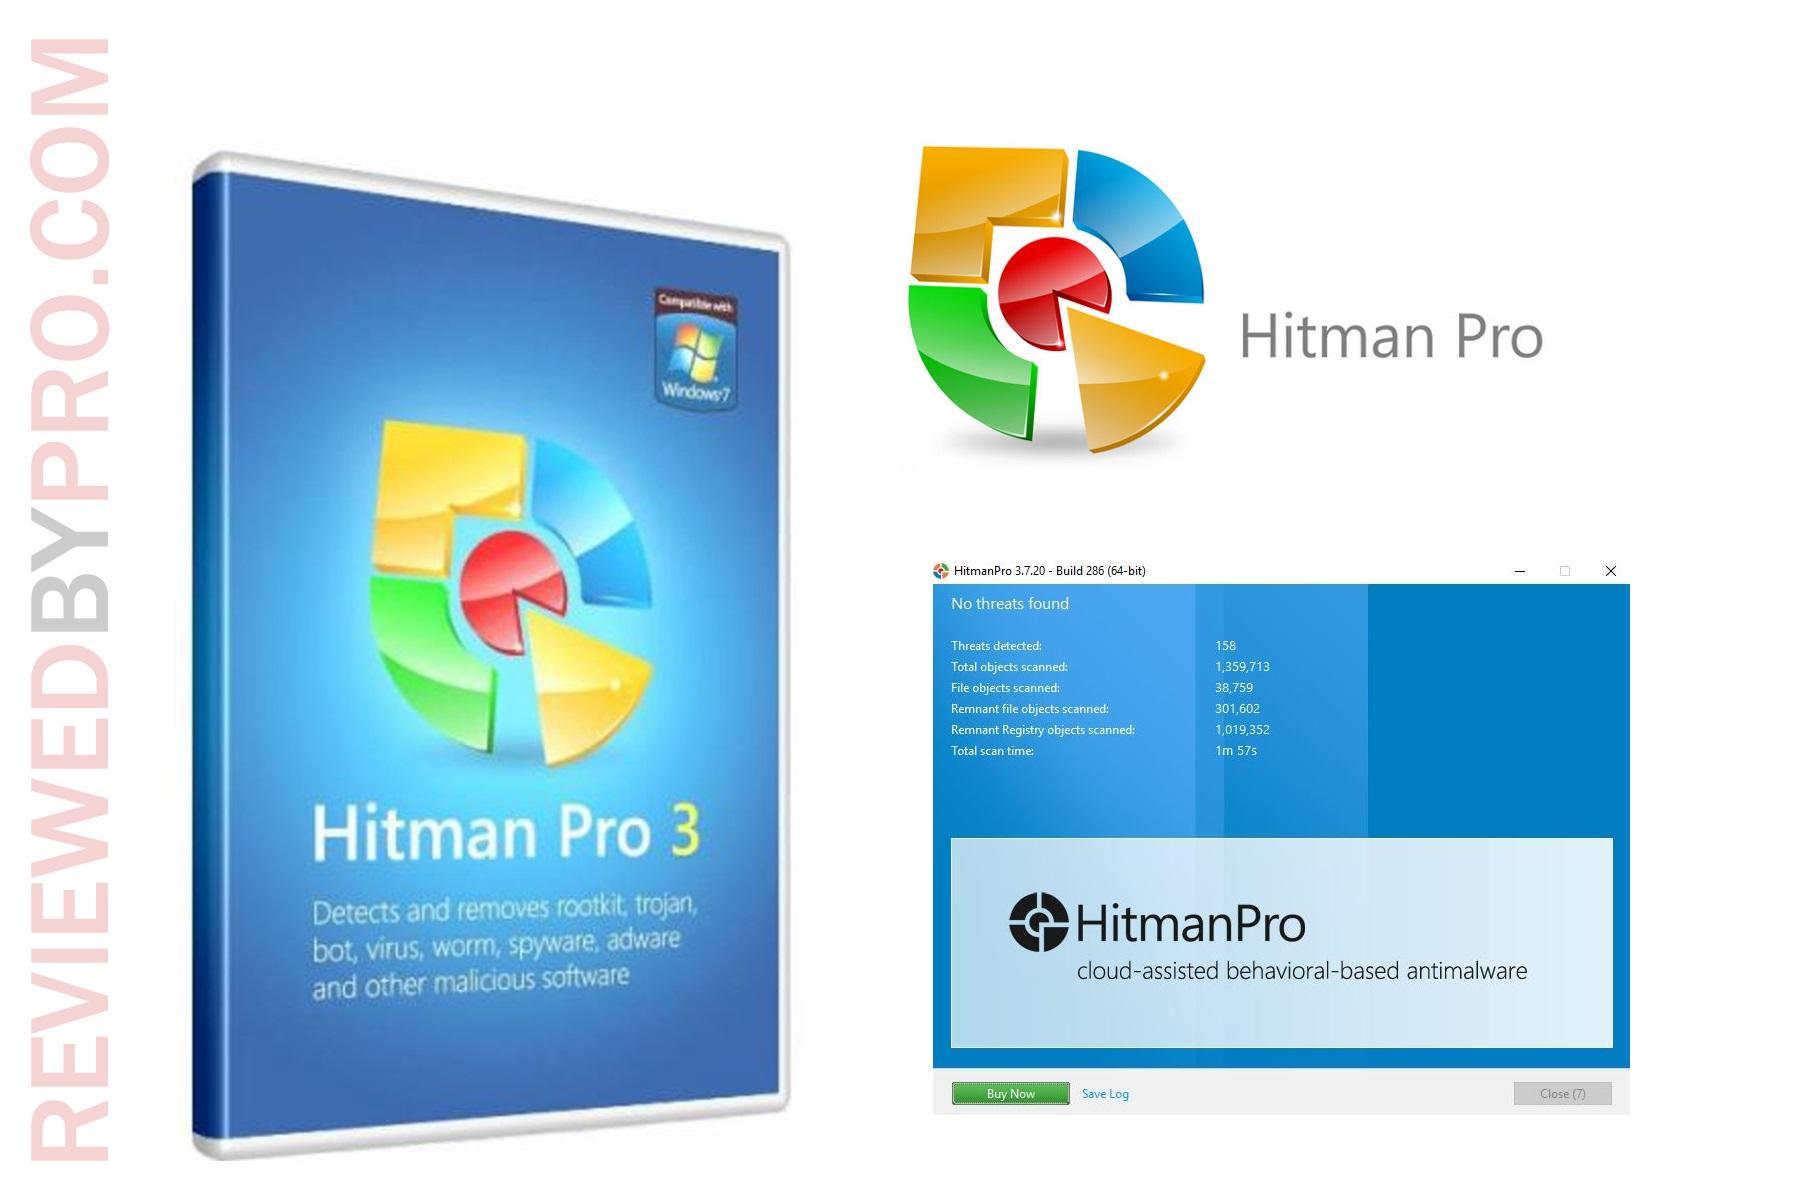 HitmanPro AntiMalware